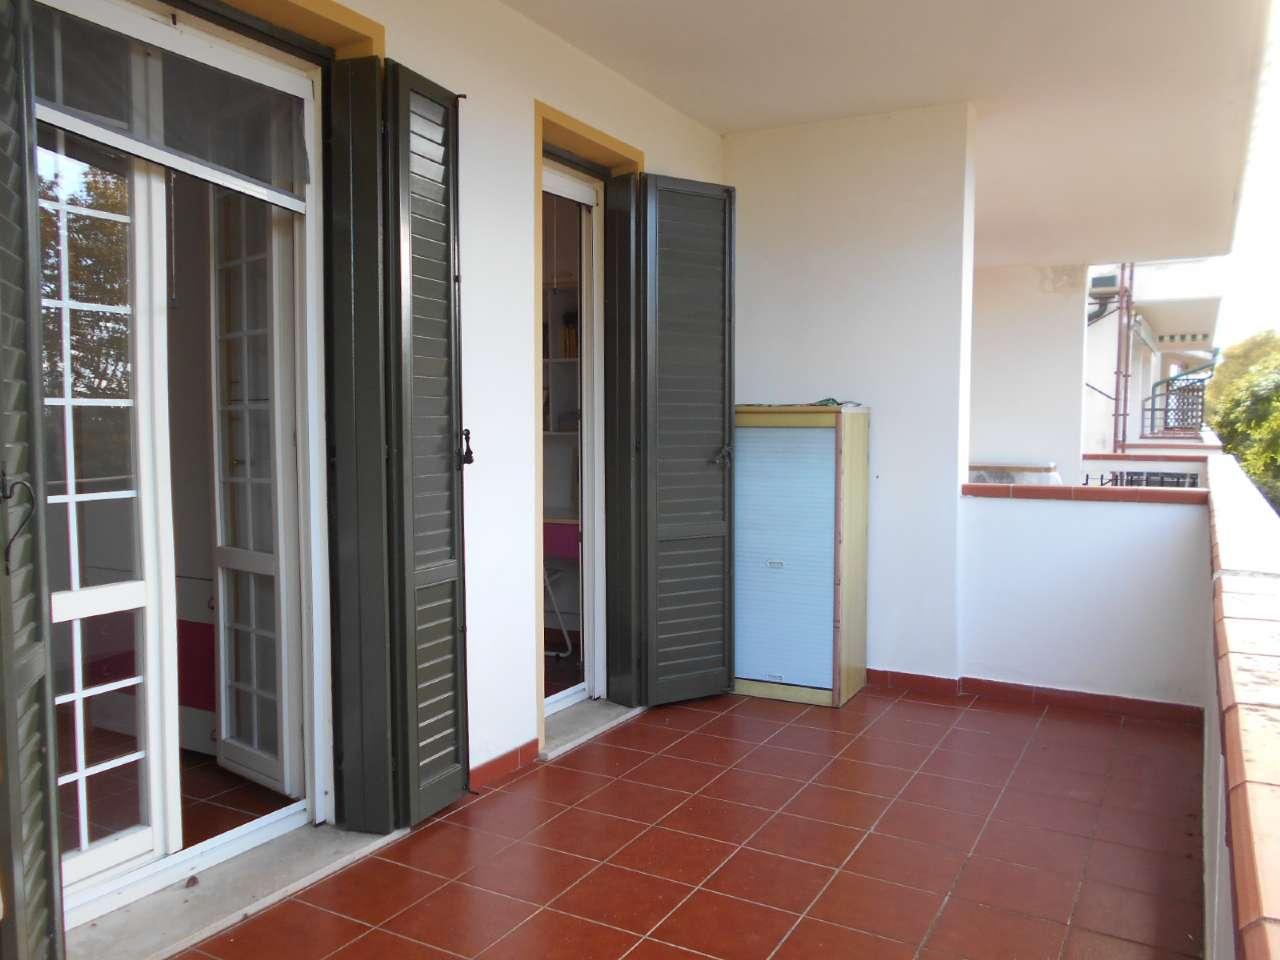 Villetta, Via Umago, Caorle, foto 5